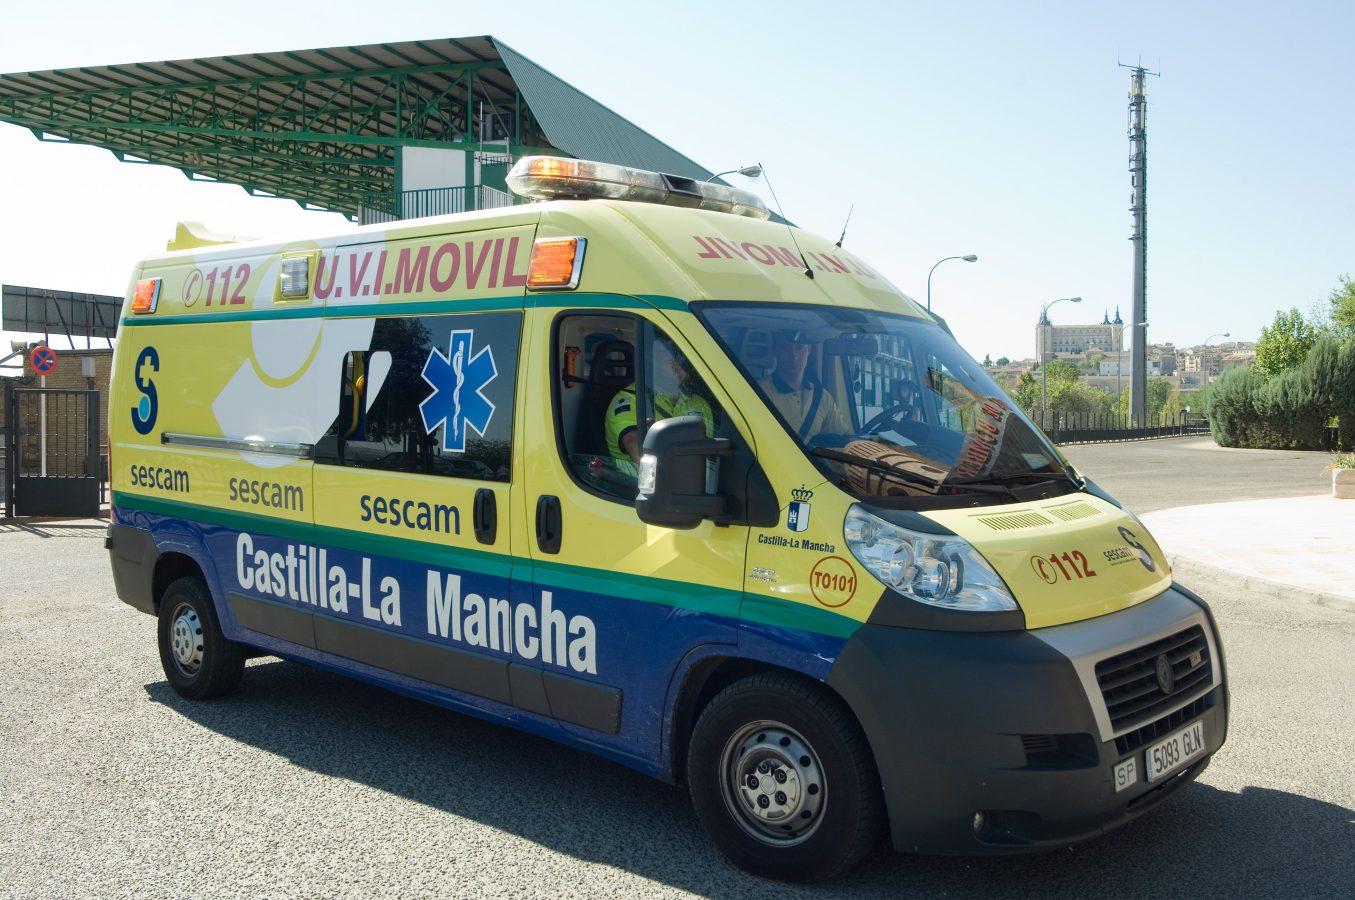 tarancón Imagen de archivo de una ambulancia del Sescam. villaseca carranque